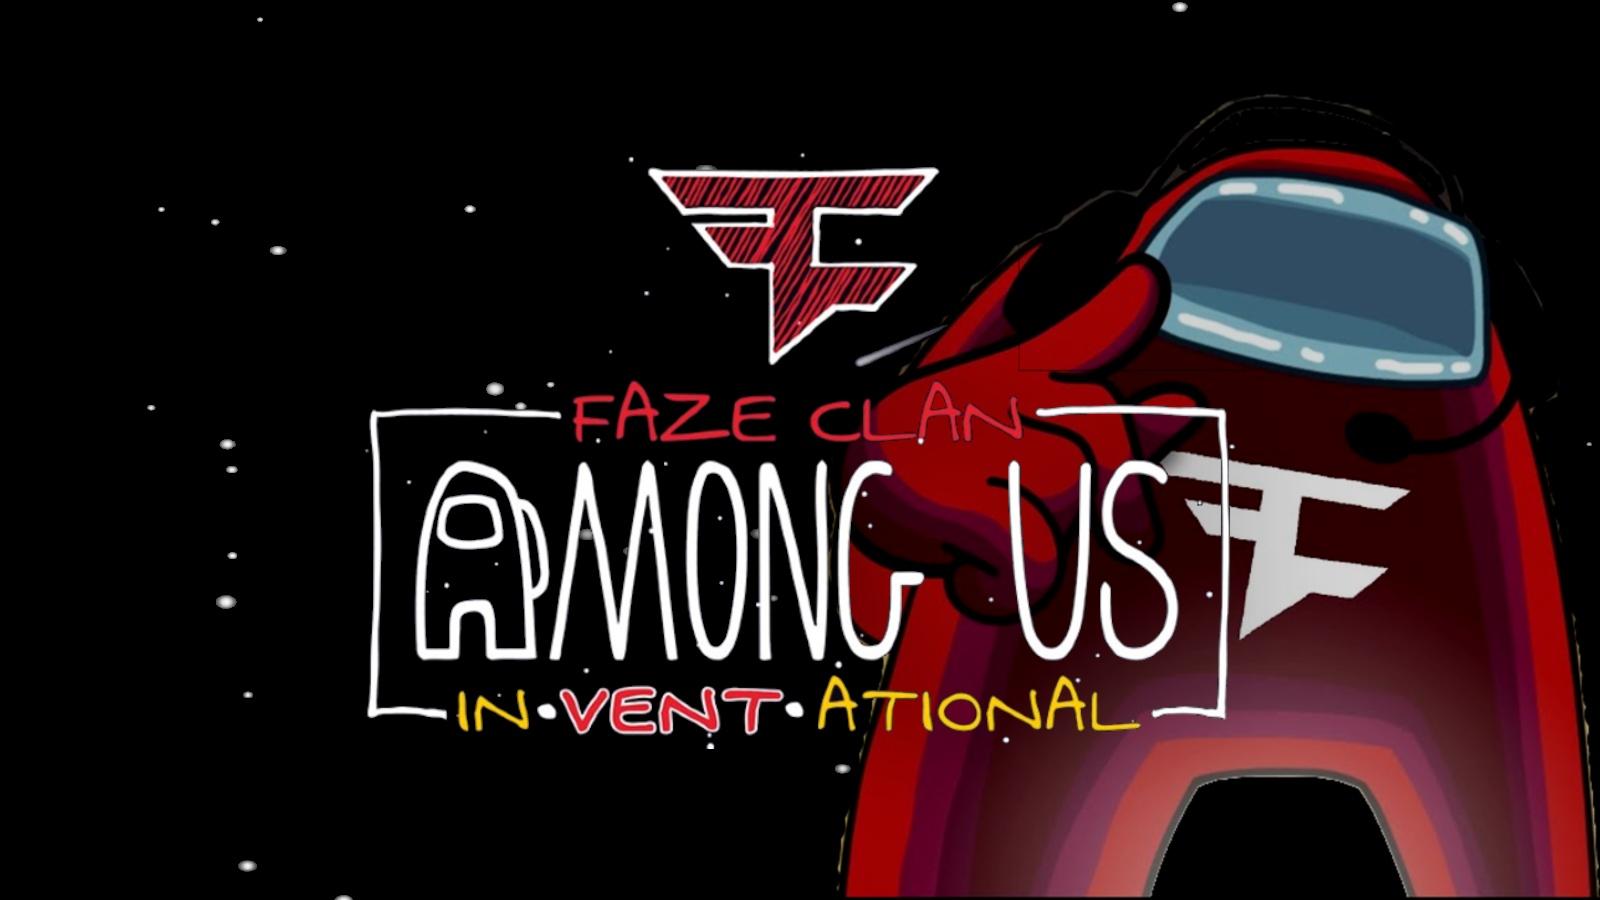 FaZe Clan Among Us Inventational